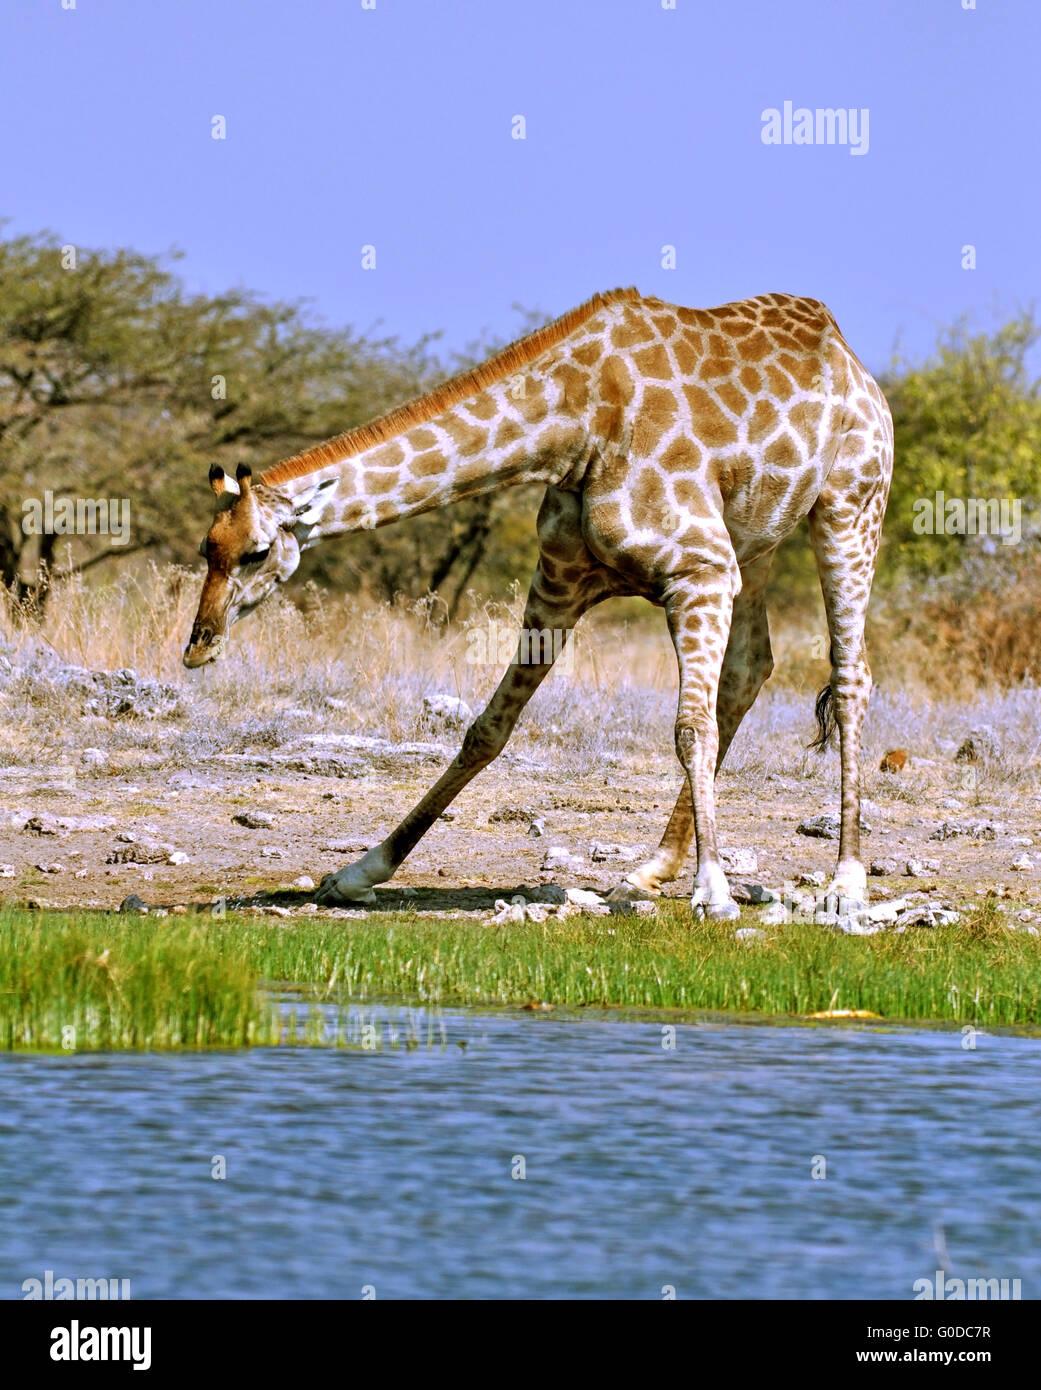 Giraffe drinking - Stock Image